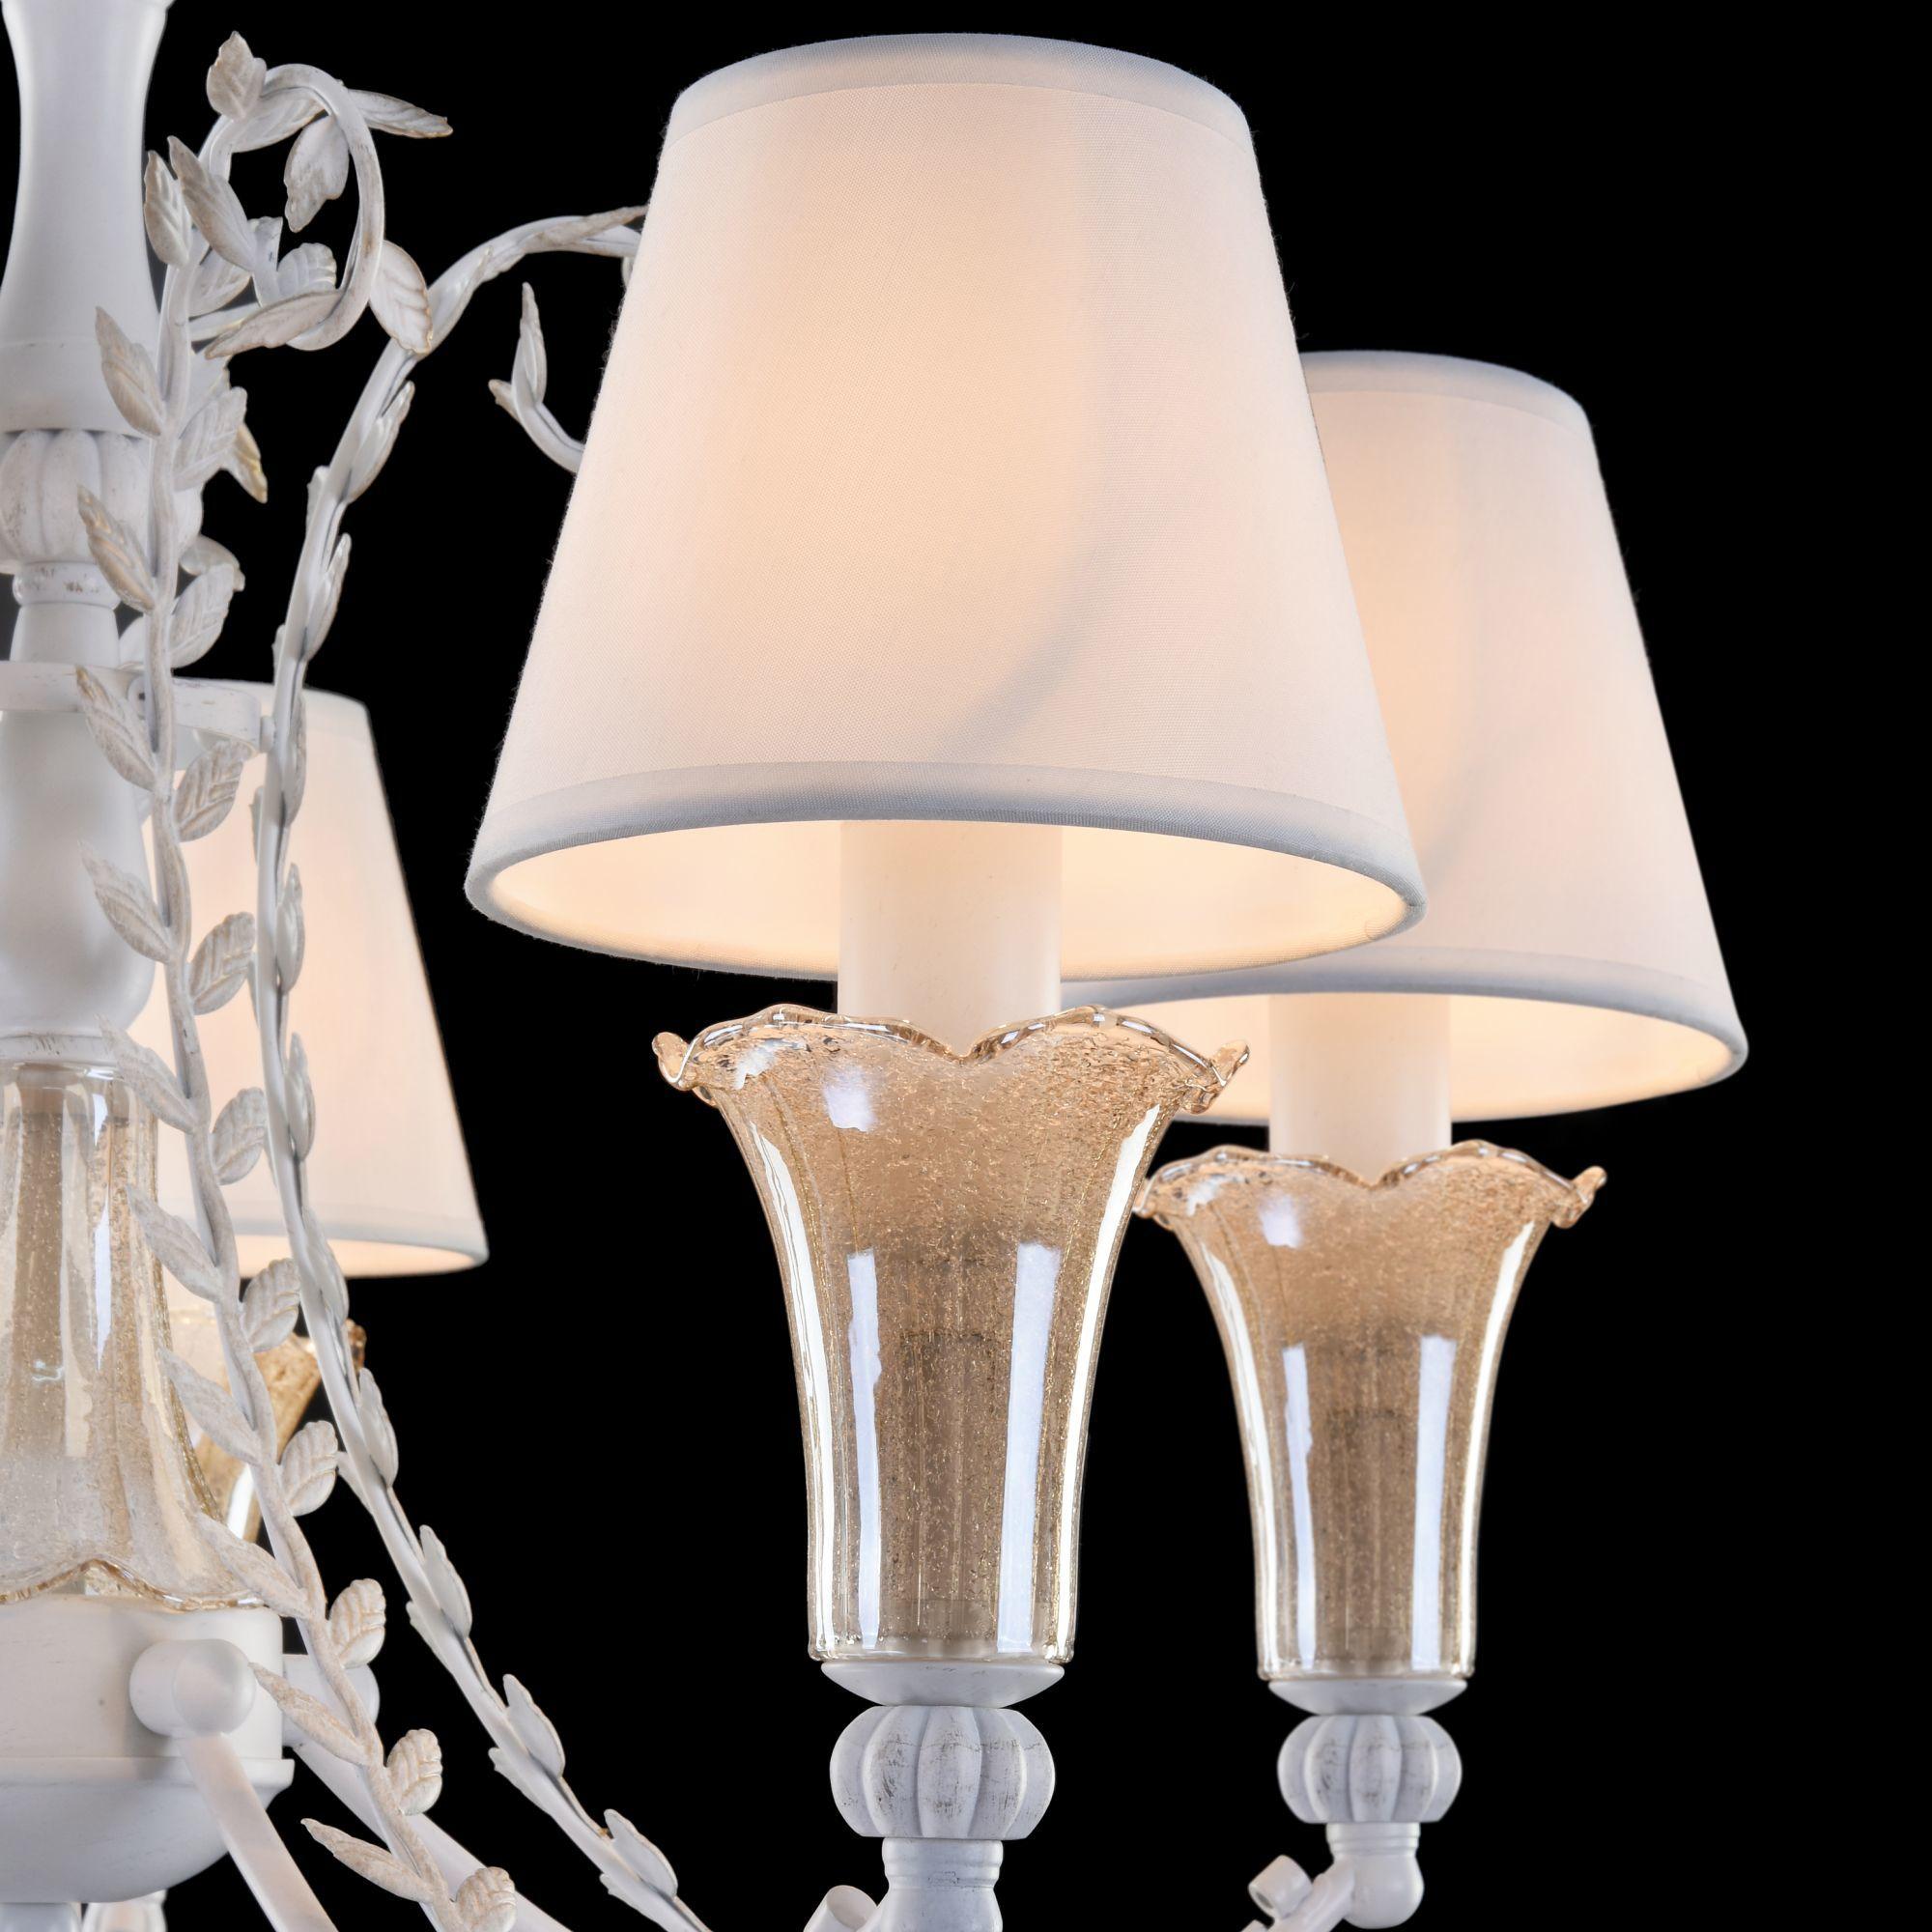 Подвесная люстра Freya Alessa FR2984-PL-05-W, 5xE14x60W, белый, янтарь, металл, стекло, текстиль - фото 5